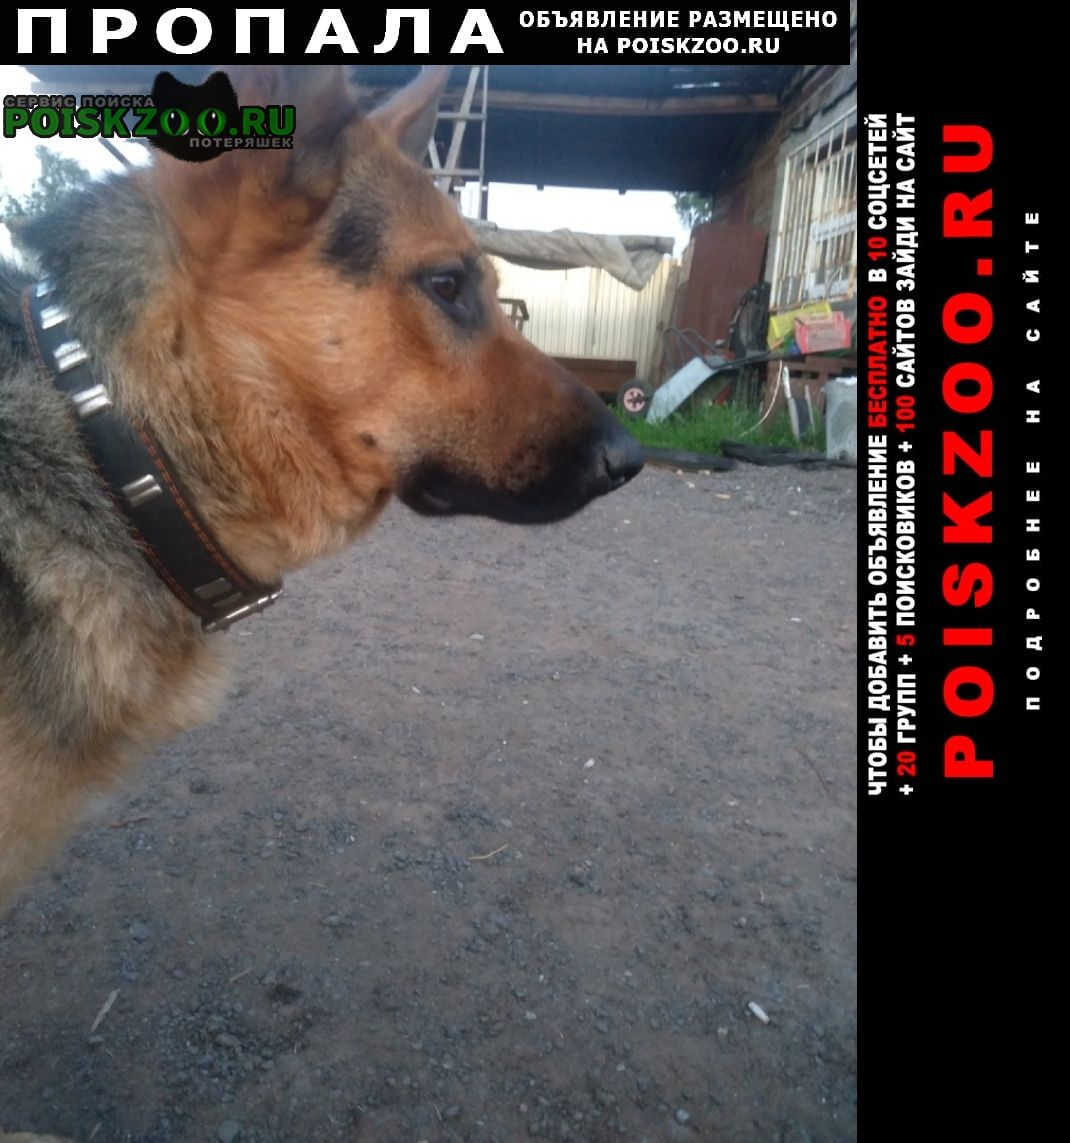 Пропала собака немецкая овчарка Пермь